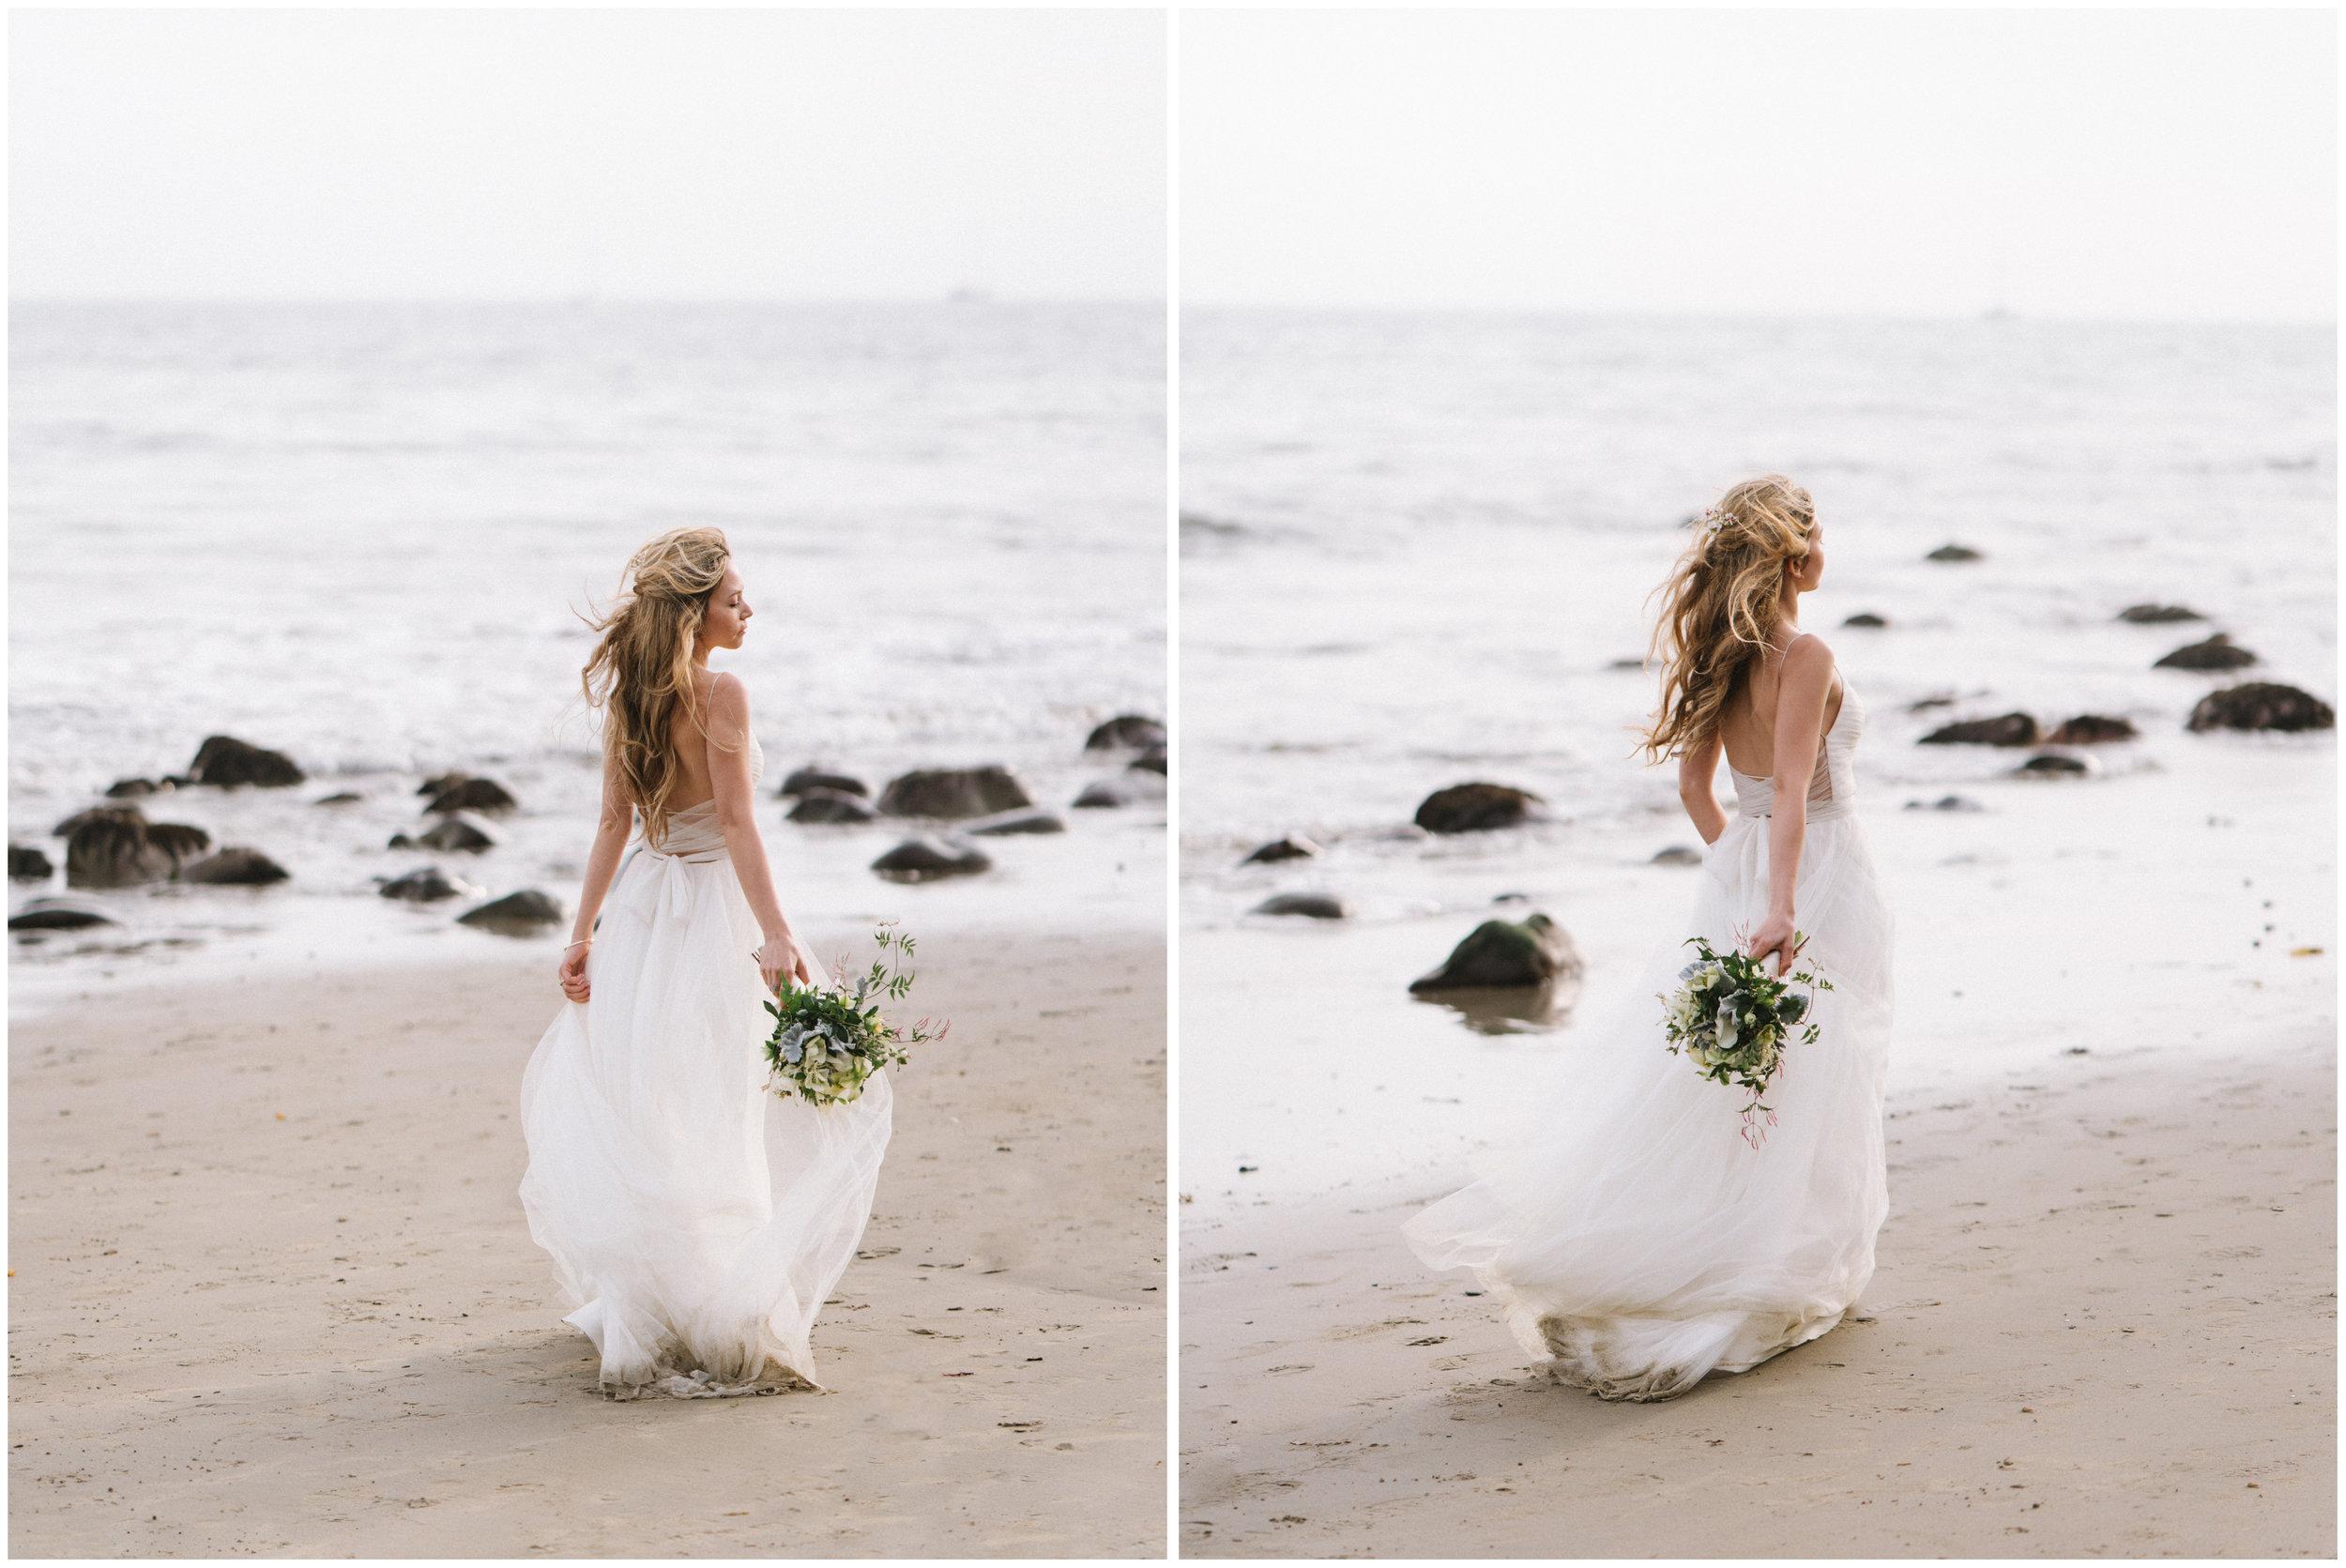 Santa Barbara Elopement Wedding Photographer - Pinnel Photography-11.jpg